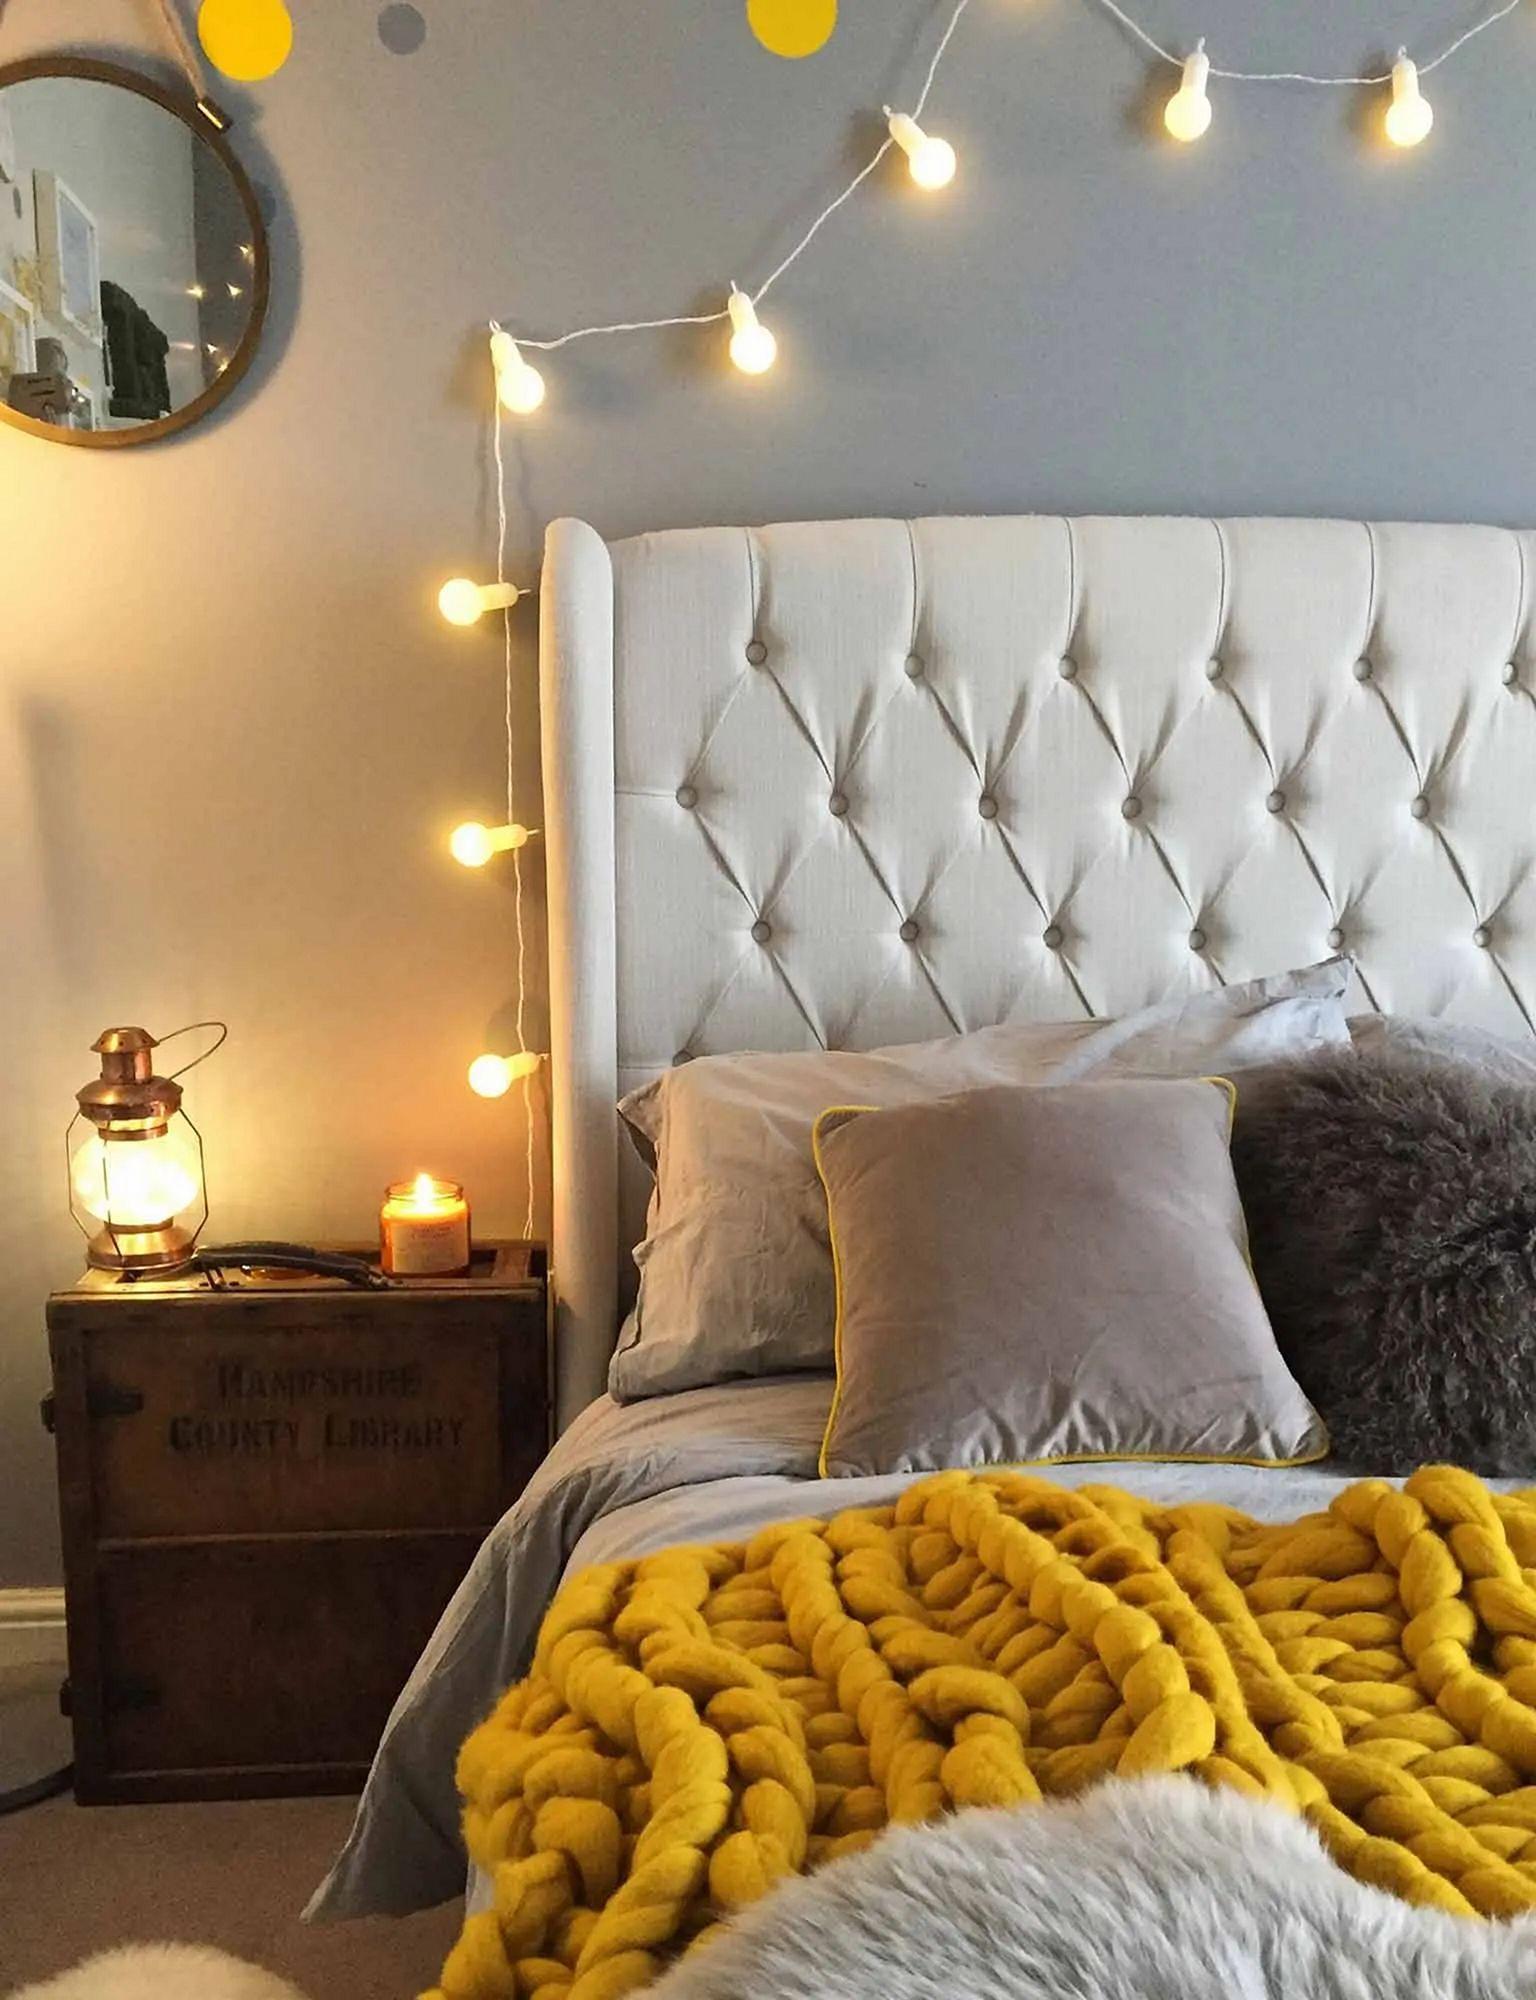 15 Impressive Diy Bedroom Lighting Ideas For More Comfort In 2020 Fairy Lights Bedroom Diy Fairy Lights Bedroom Bedroom Decor